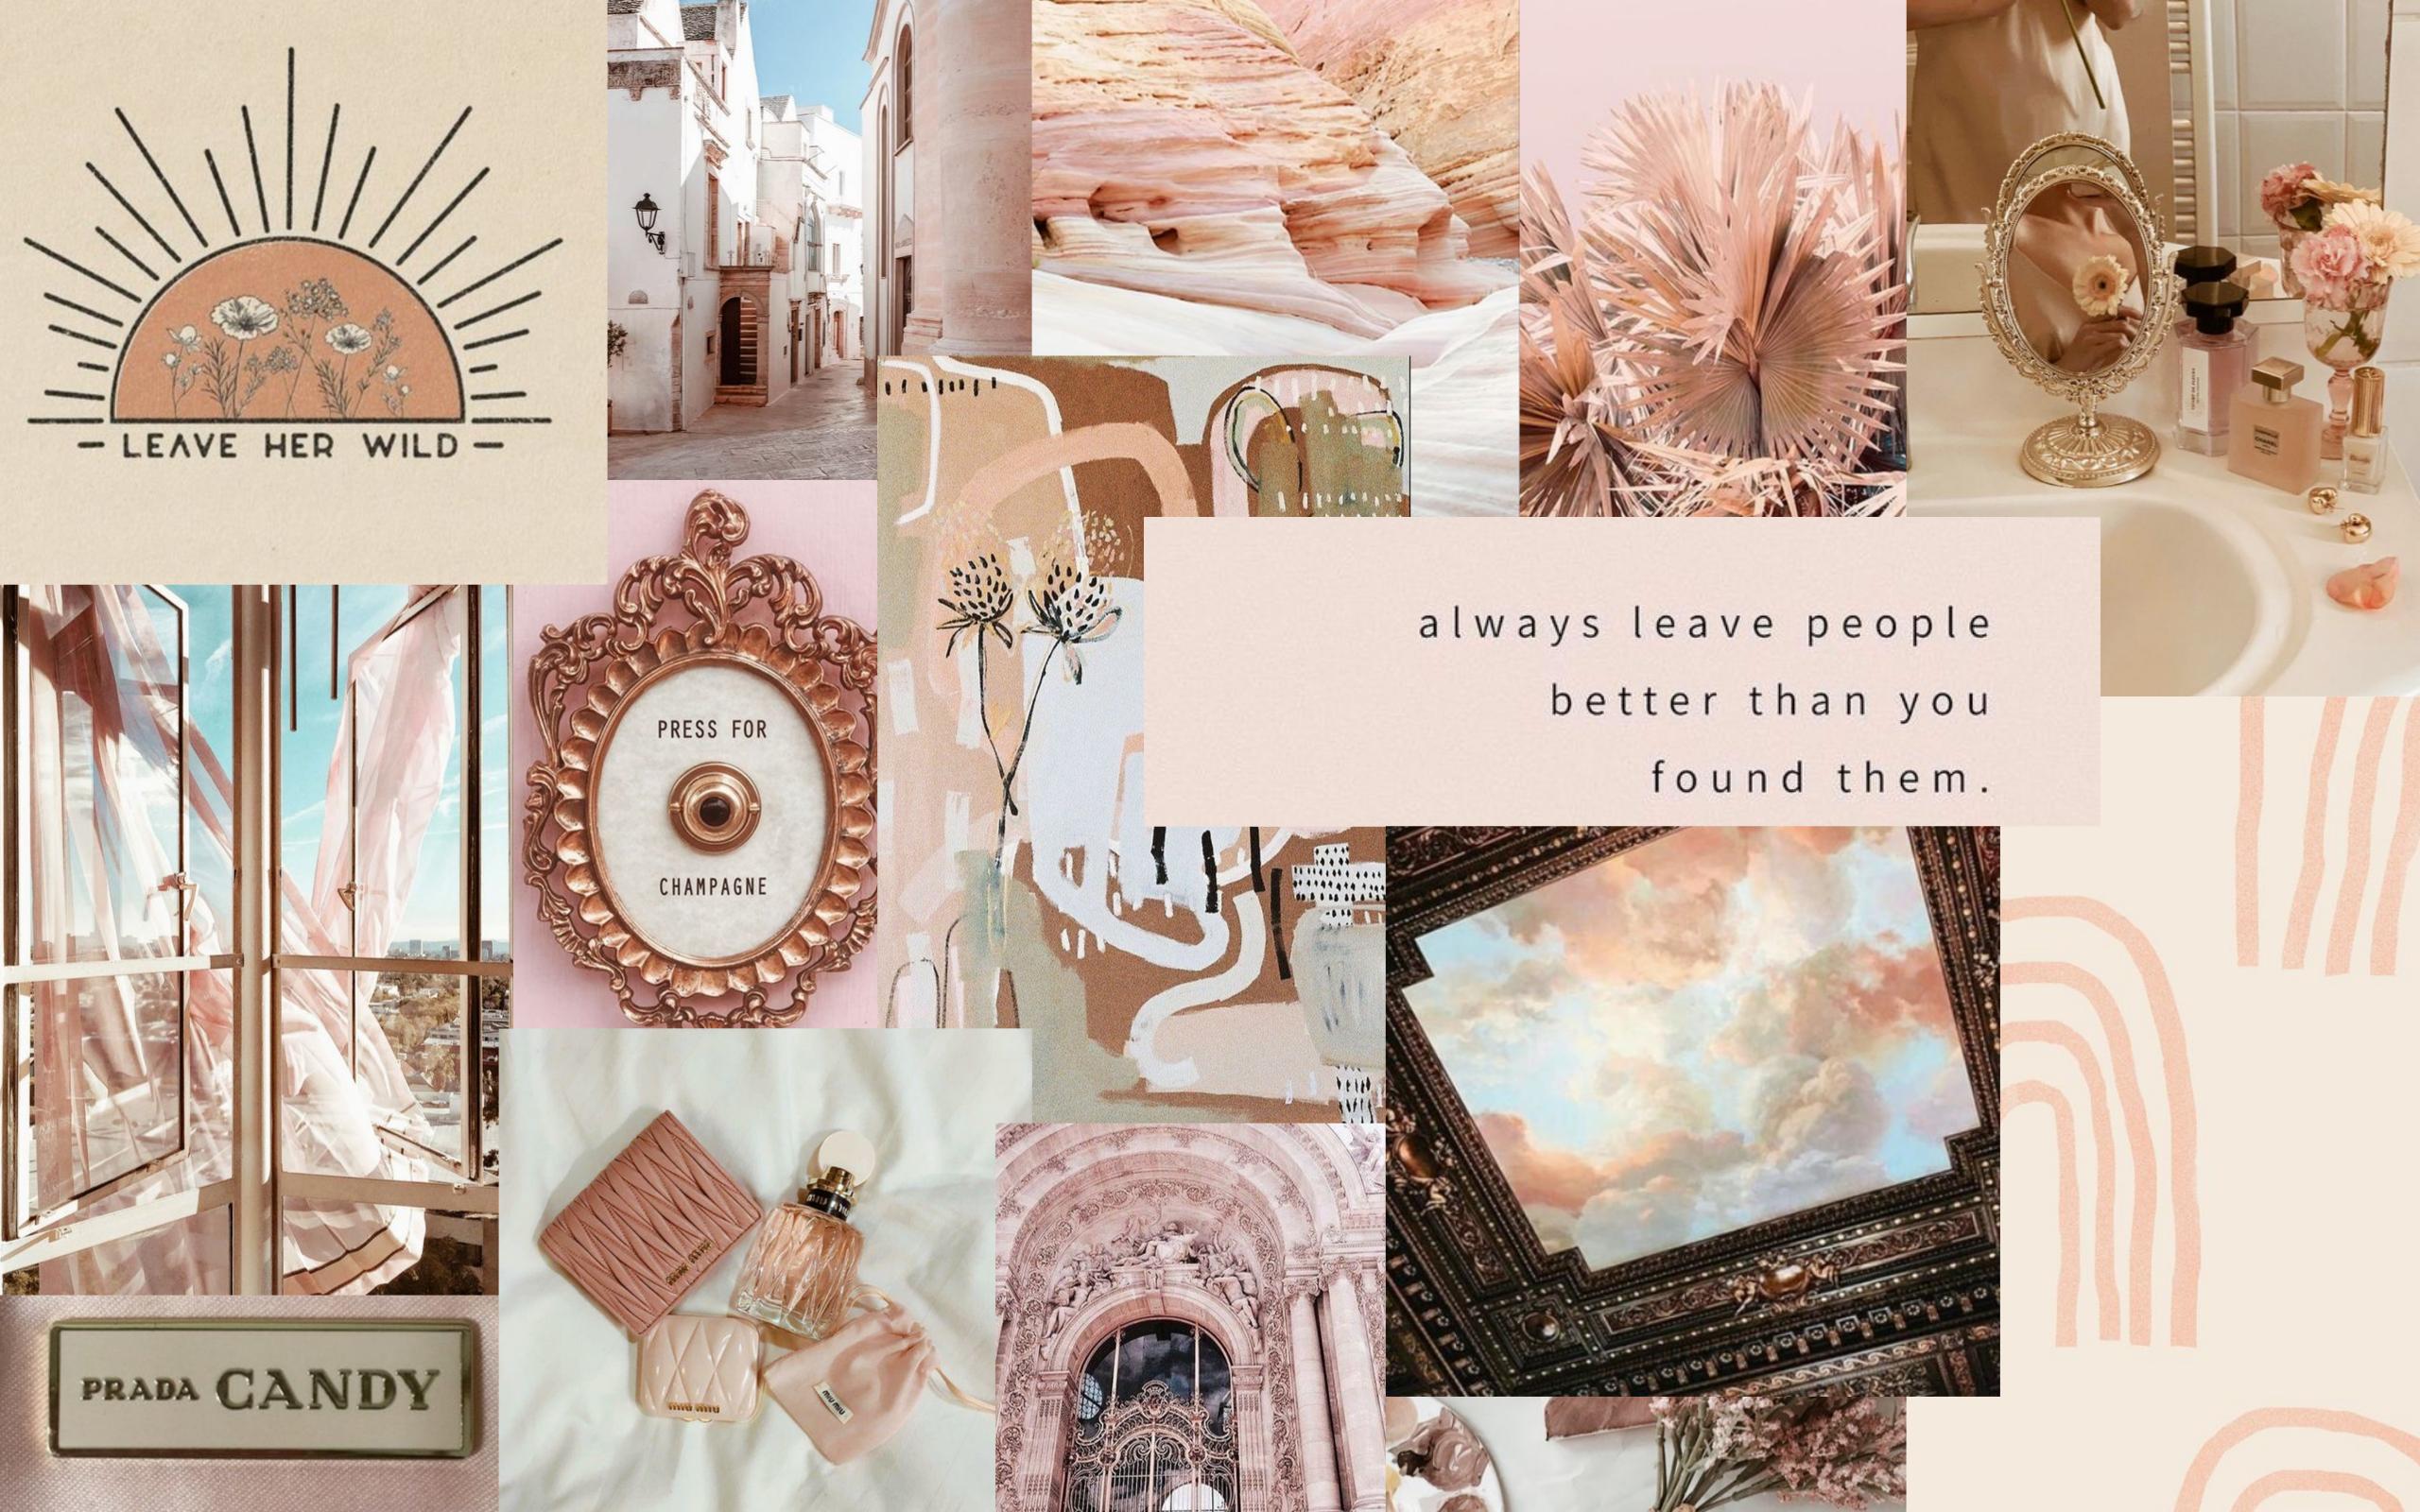 Aesthetic quran quotes wallpaper iphone hd; 13+ Vintage Macbook Wallpaper Aesthetic Collage Wallpaper ...